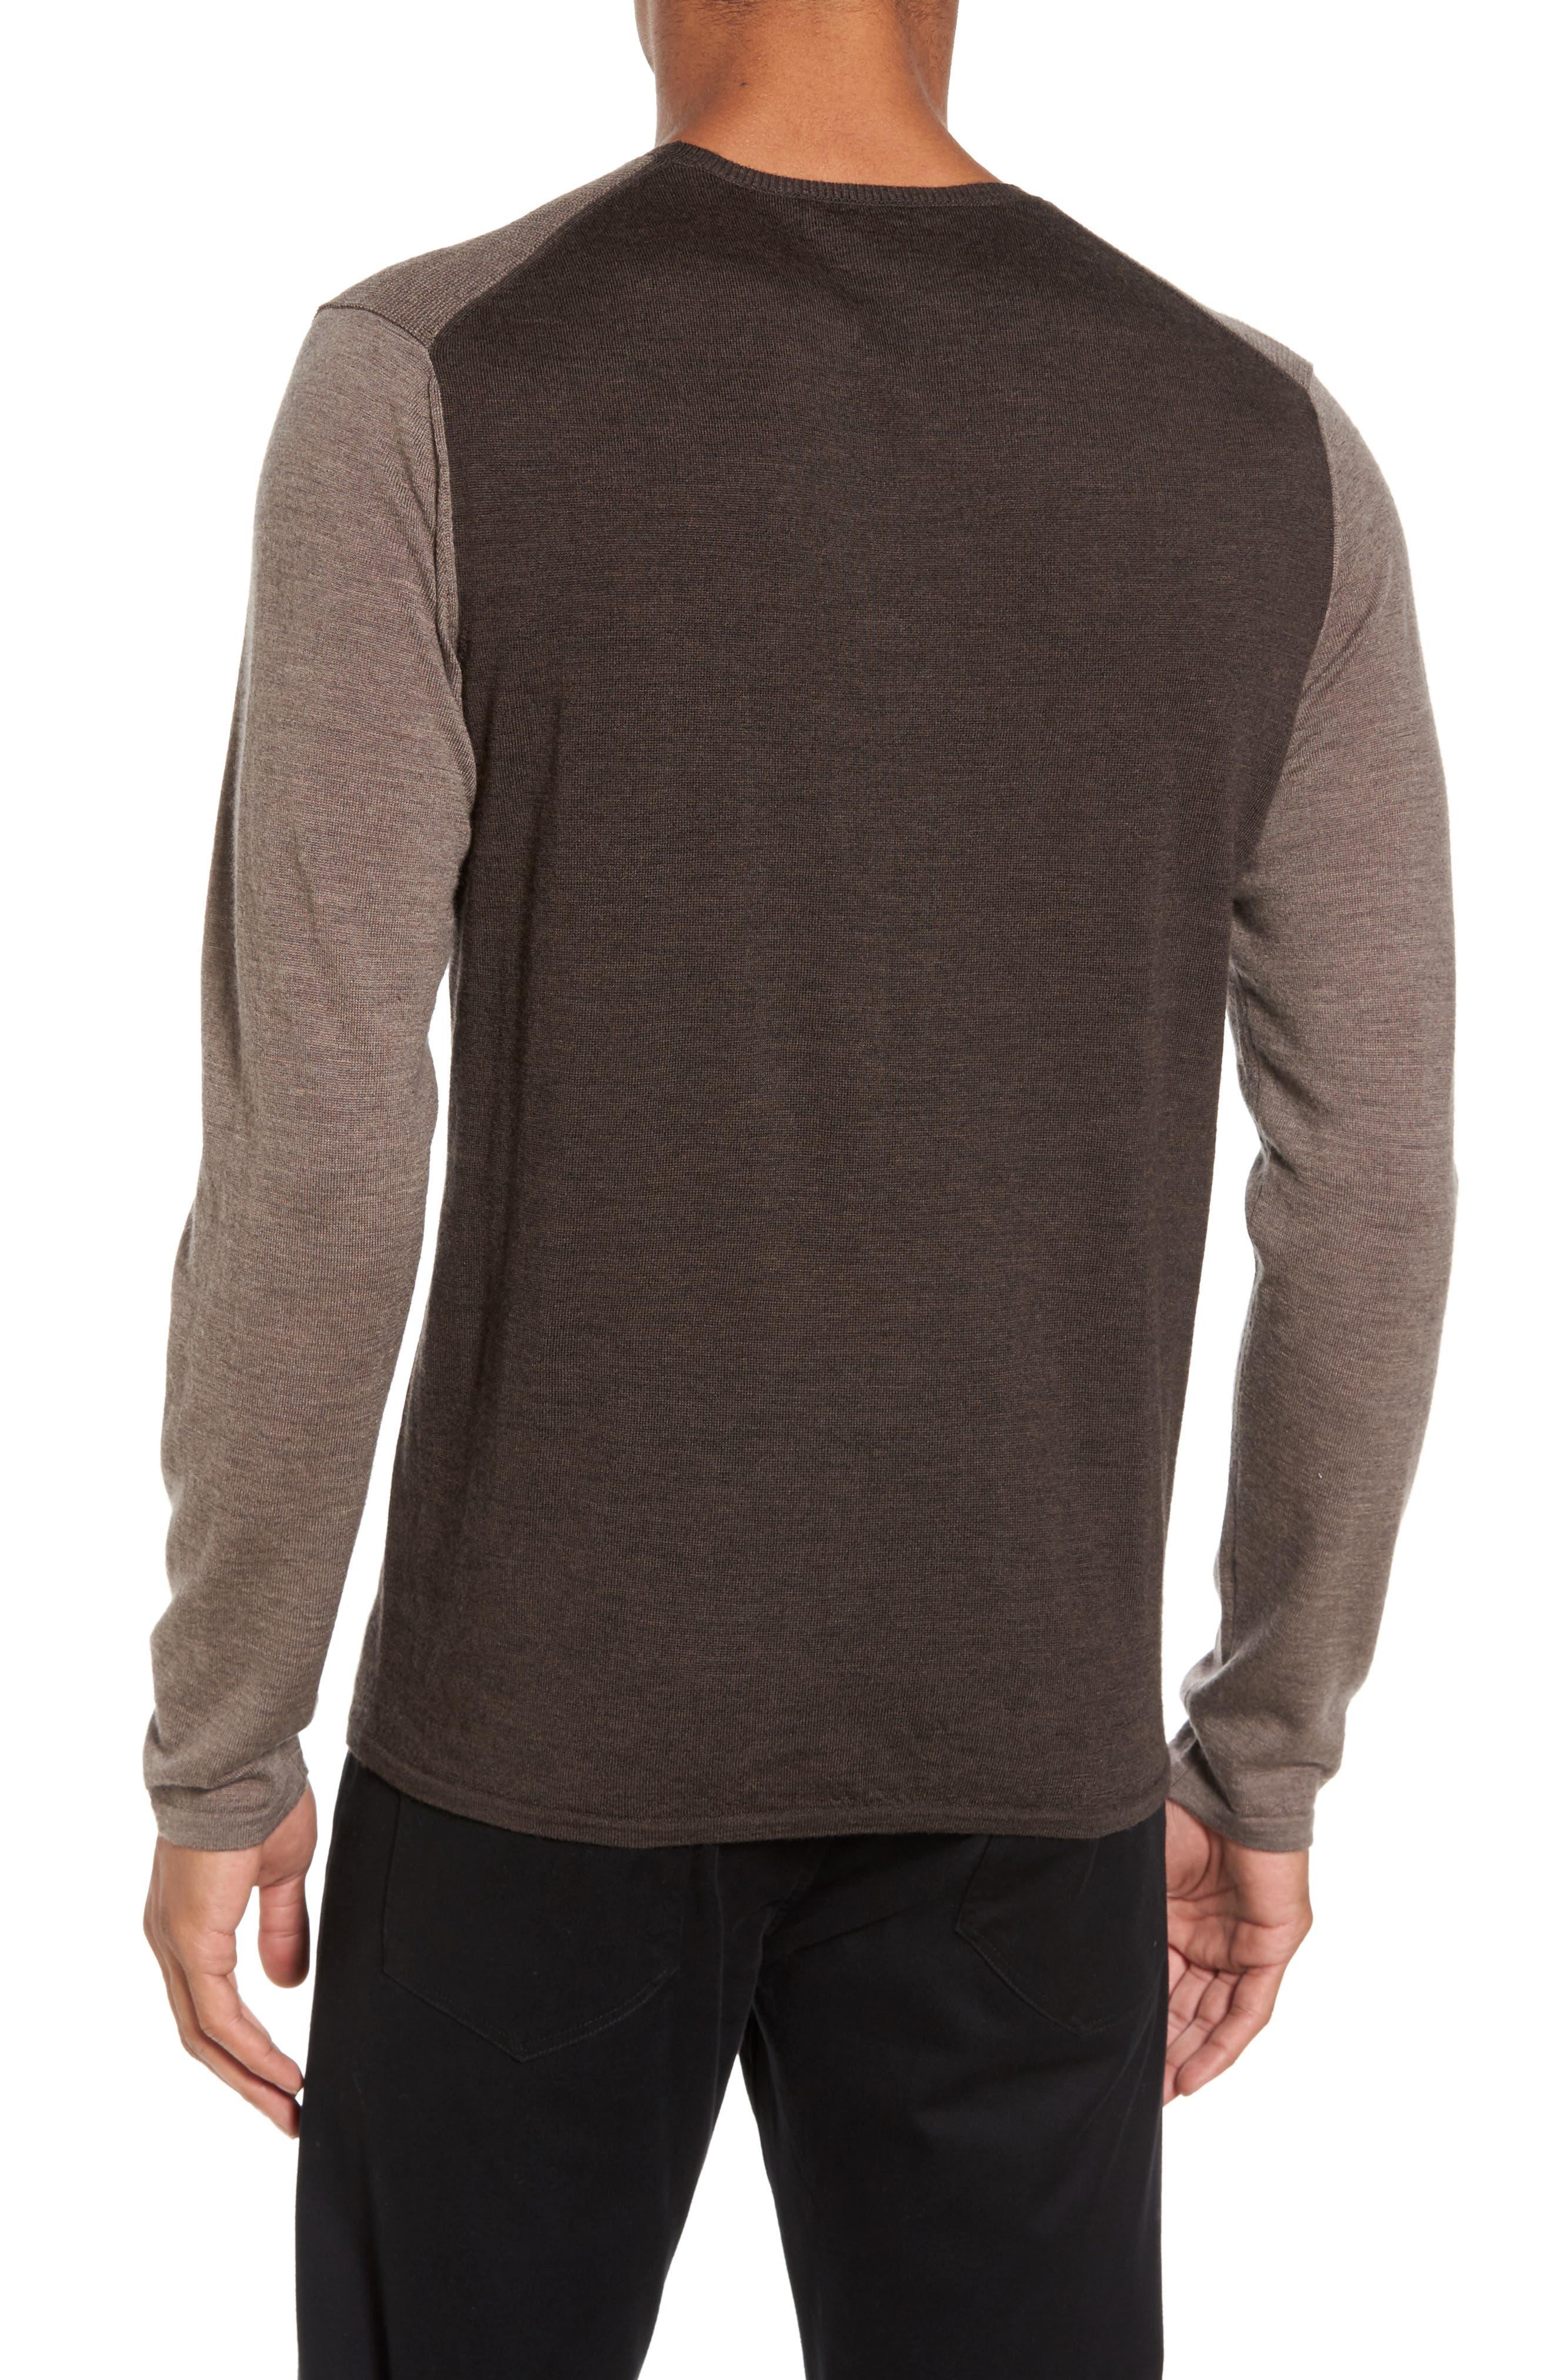 Huxley Merino Sweater,                             Alternate thumbnail 2, color,                             LIGHT COFFEE